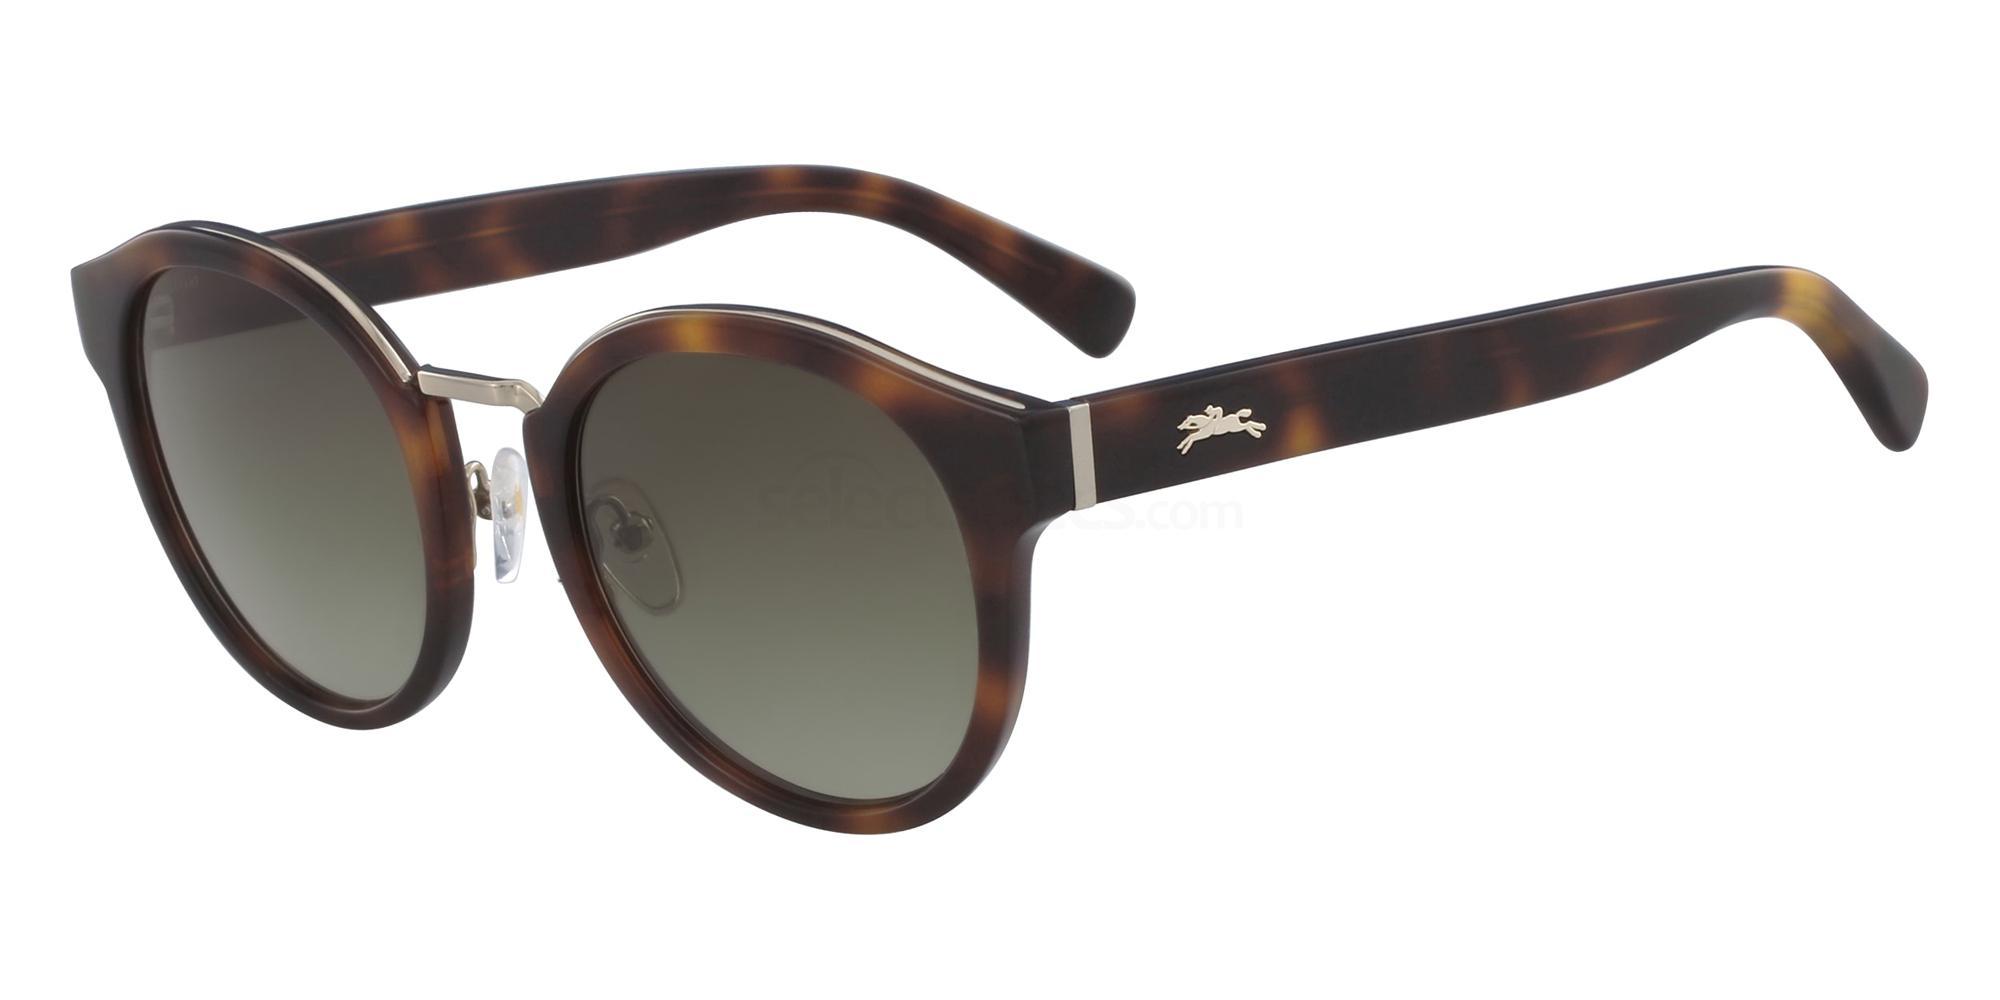 214 LO603S Sunglasses, LONGCHAMP